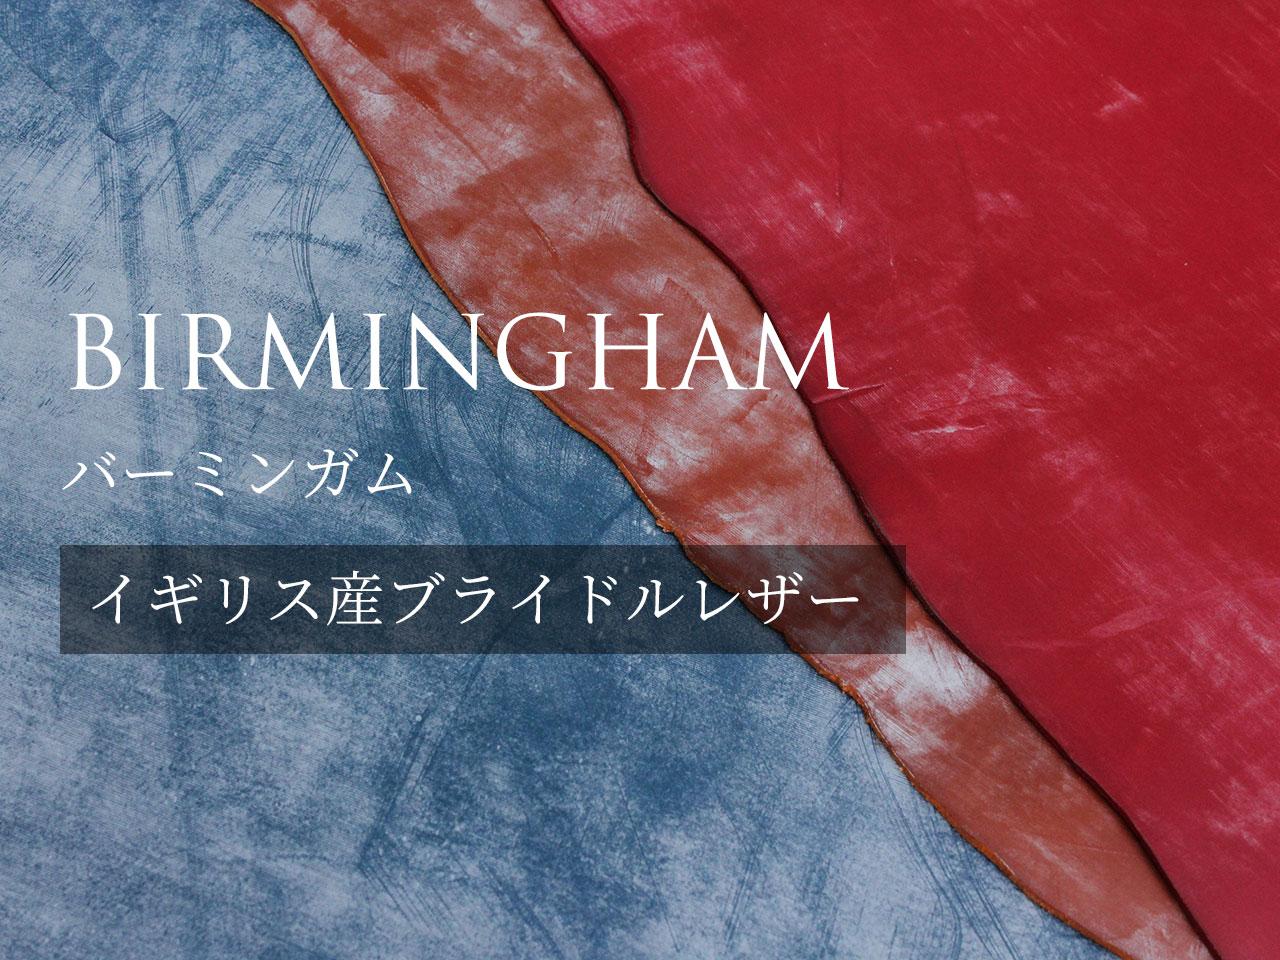 BIRMINGHAM(バーミンガム)について